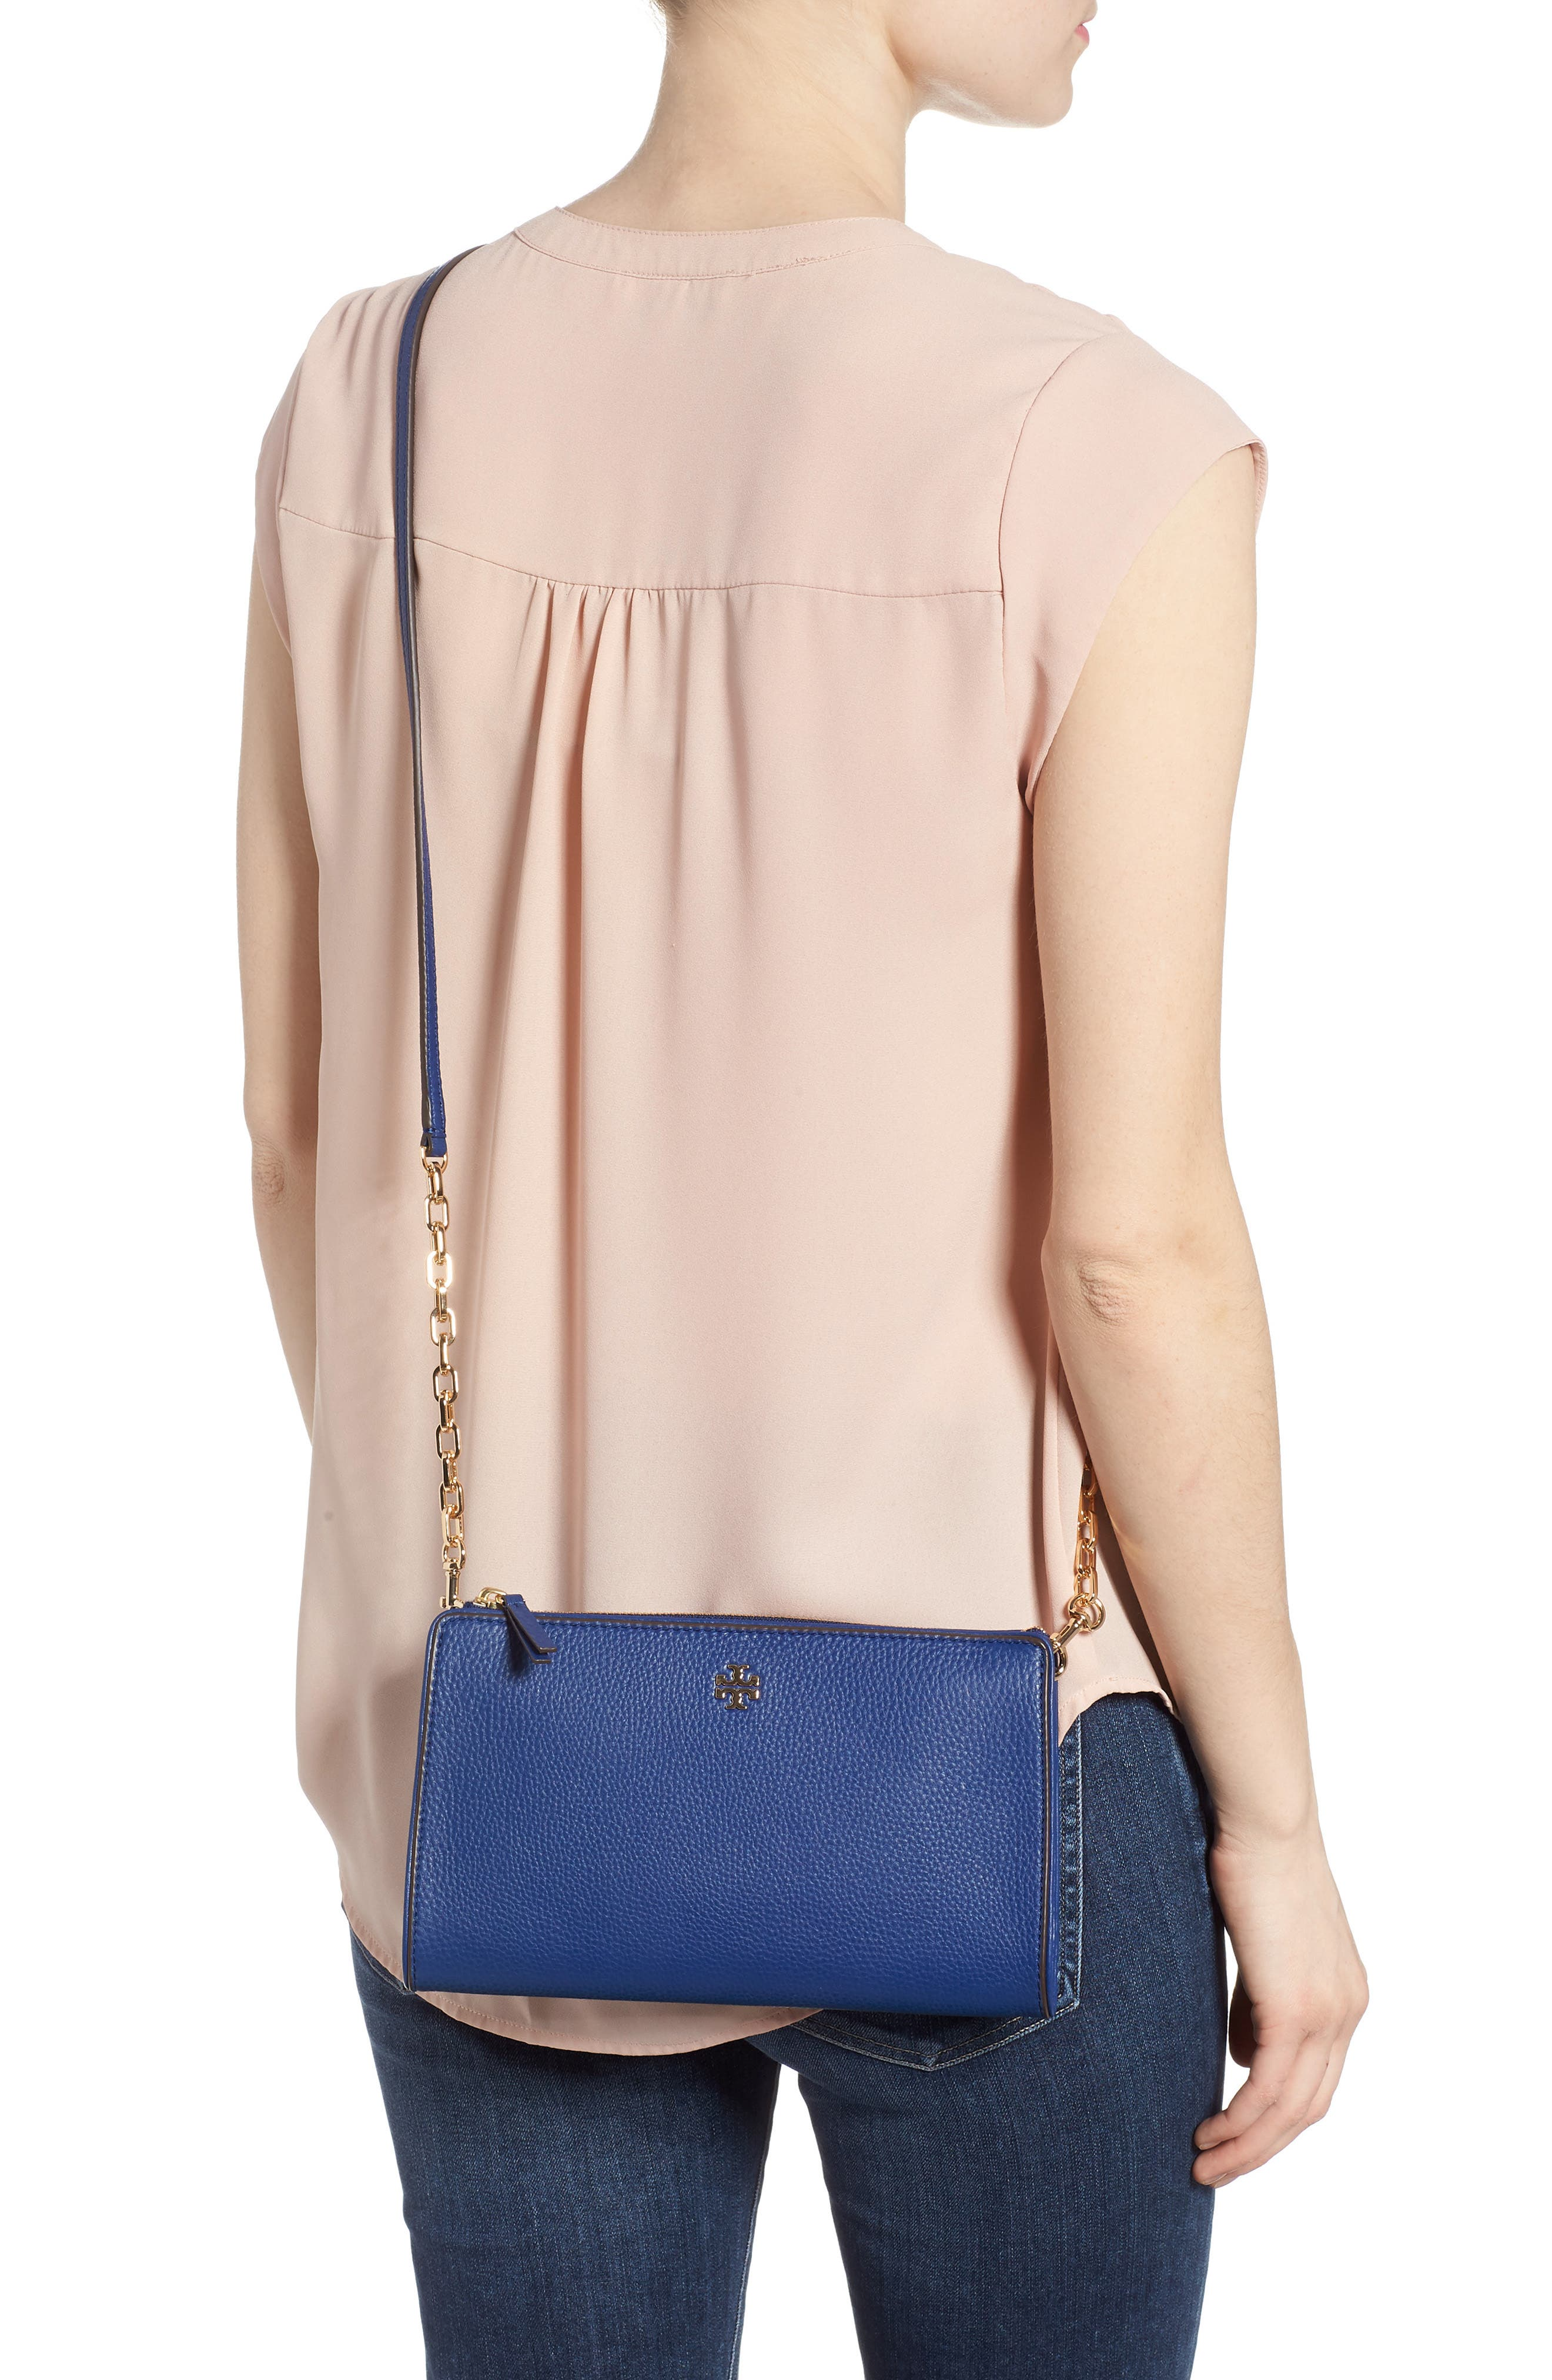 Marsden Leather Wallet Crossbody Bag,                             Alternate thumbnail 2, color,                             FRESH BLUEBERRY